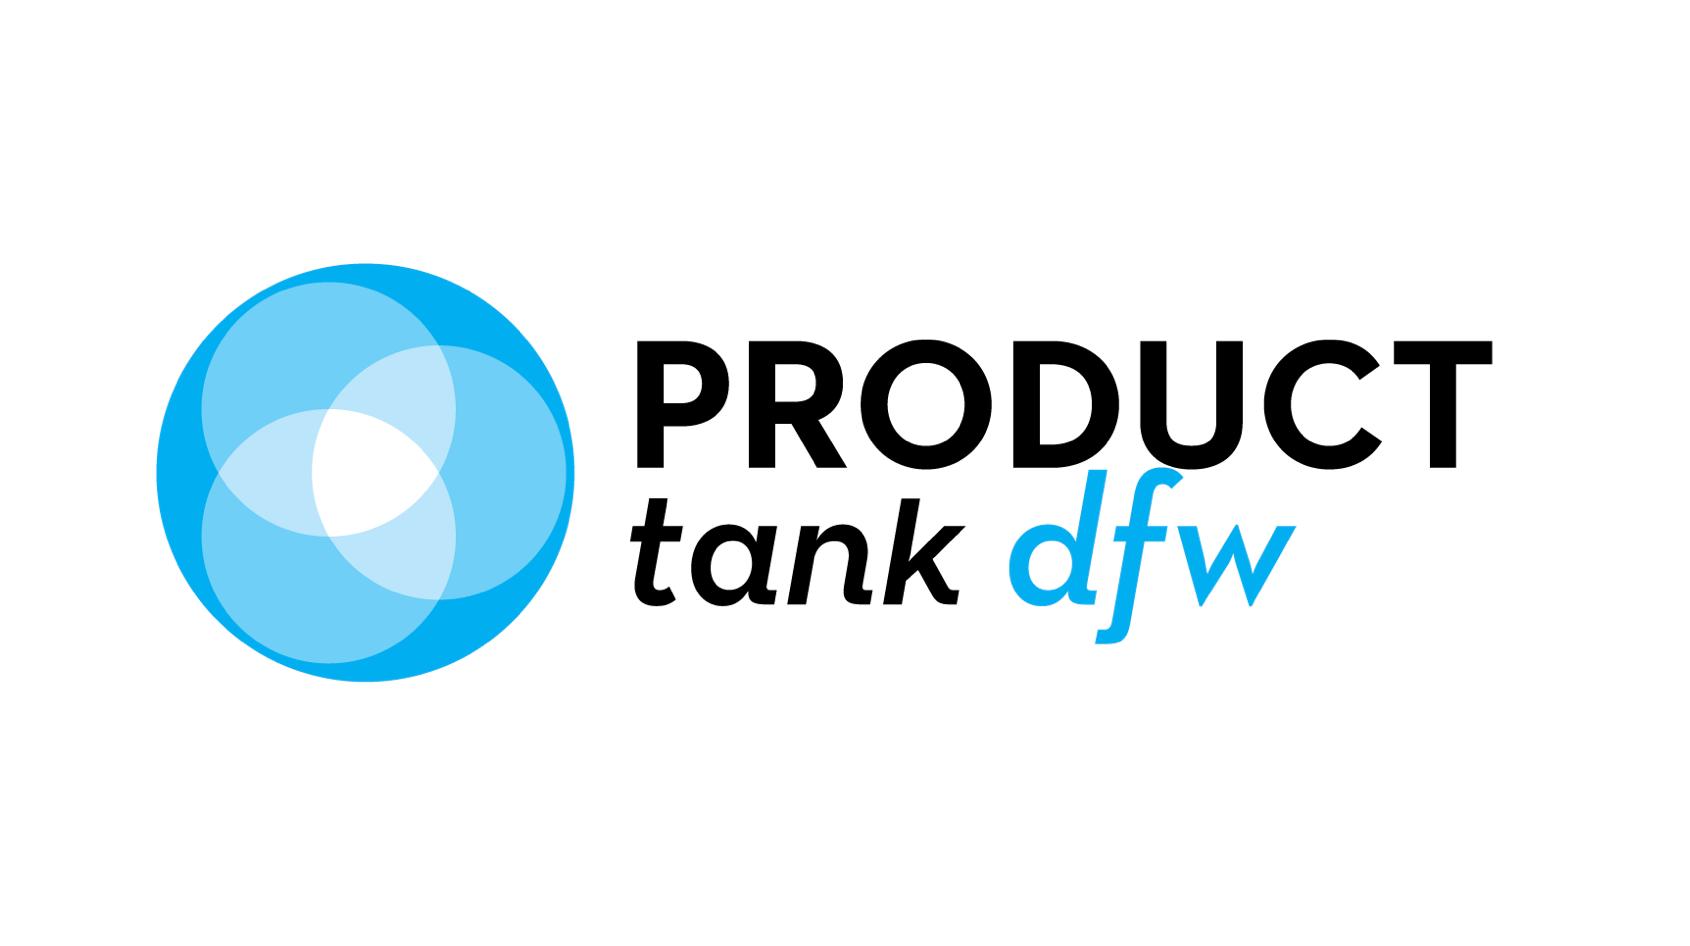 ProductTank DFW